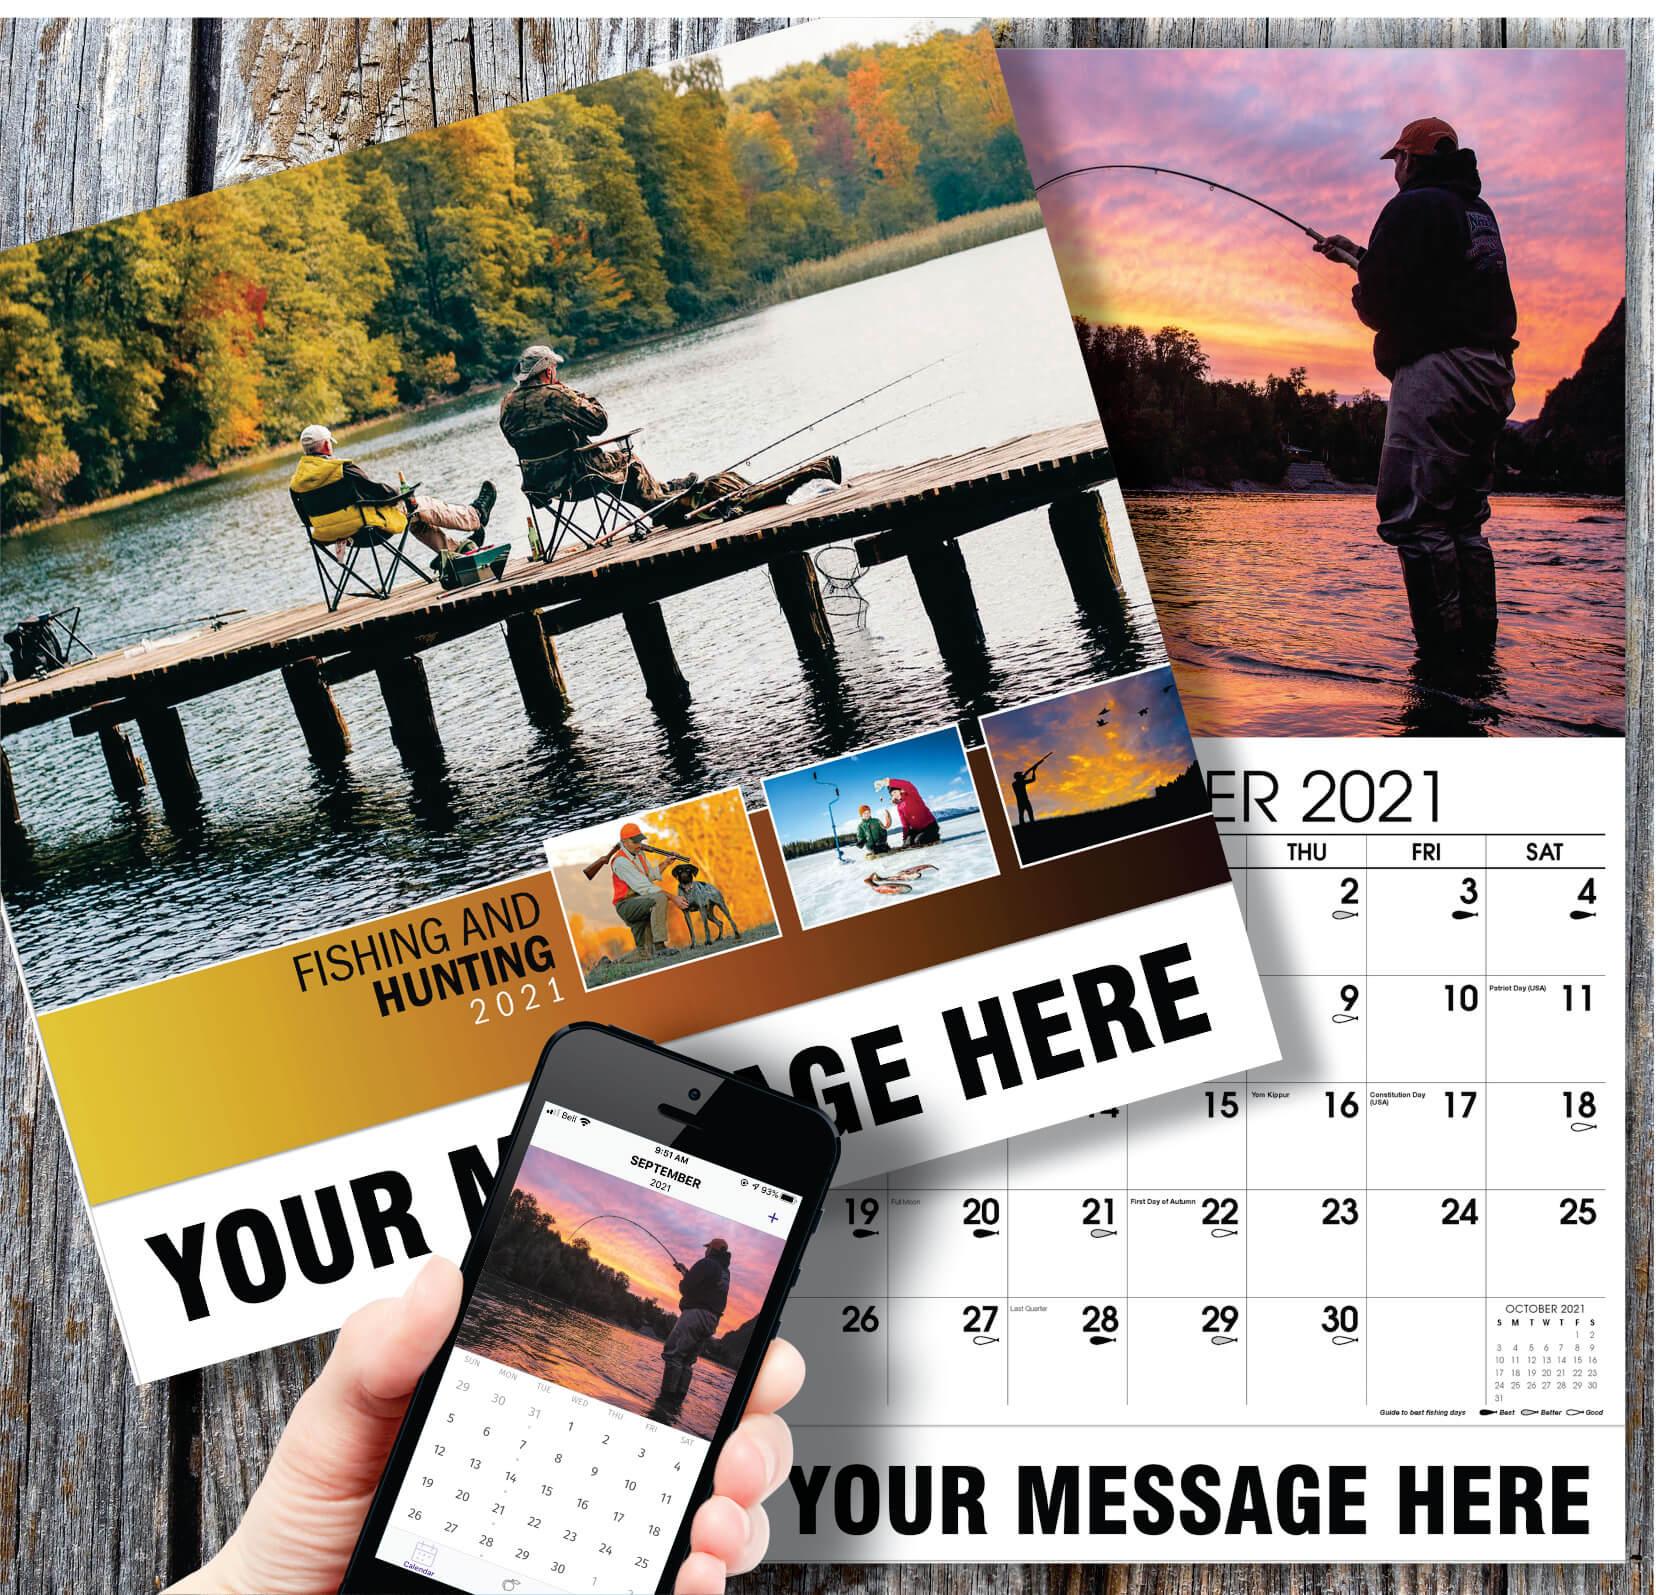 2021 Promotional Advertising Calendar   Fishing And Hunting regarding Hunting Calendar 2021